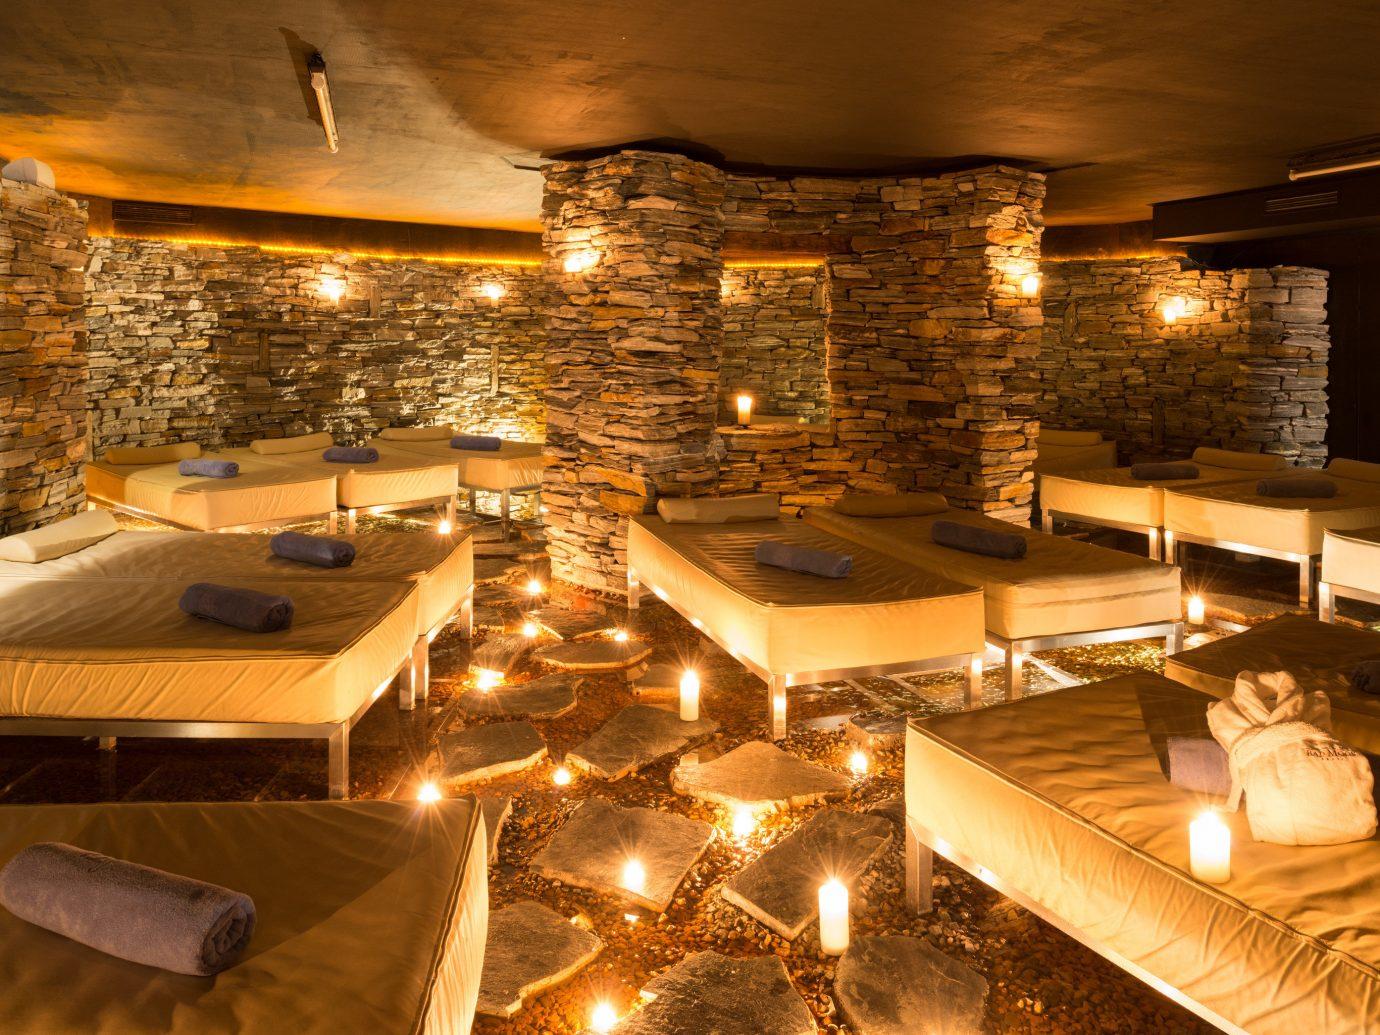 All-Inclusive Resorts Hotels lighting interior design restaurant wood flooring